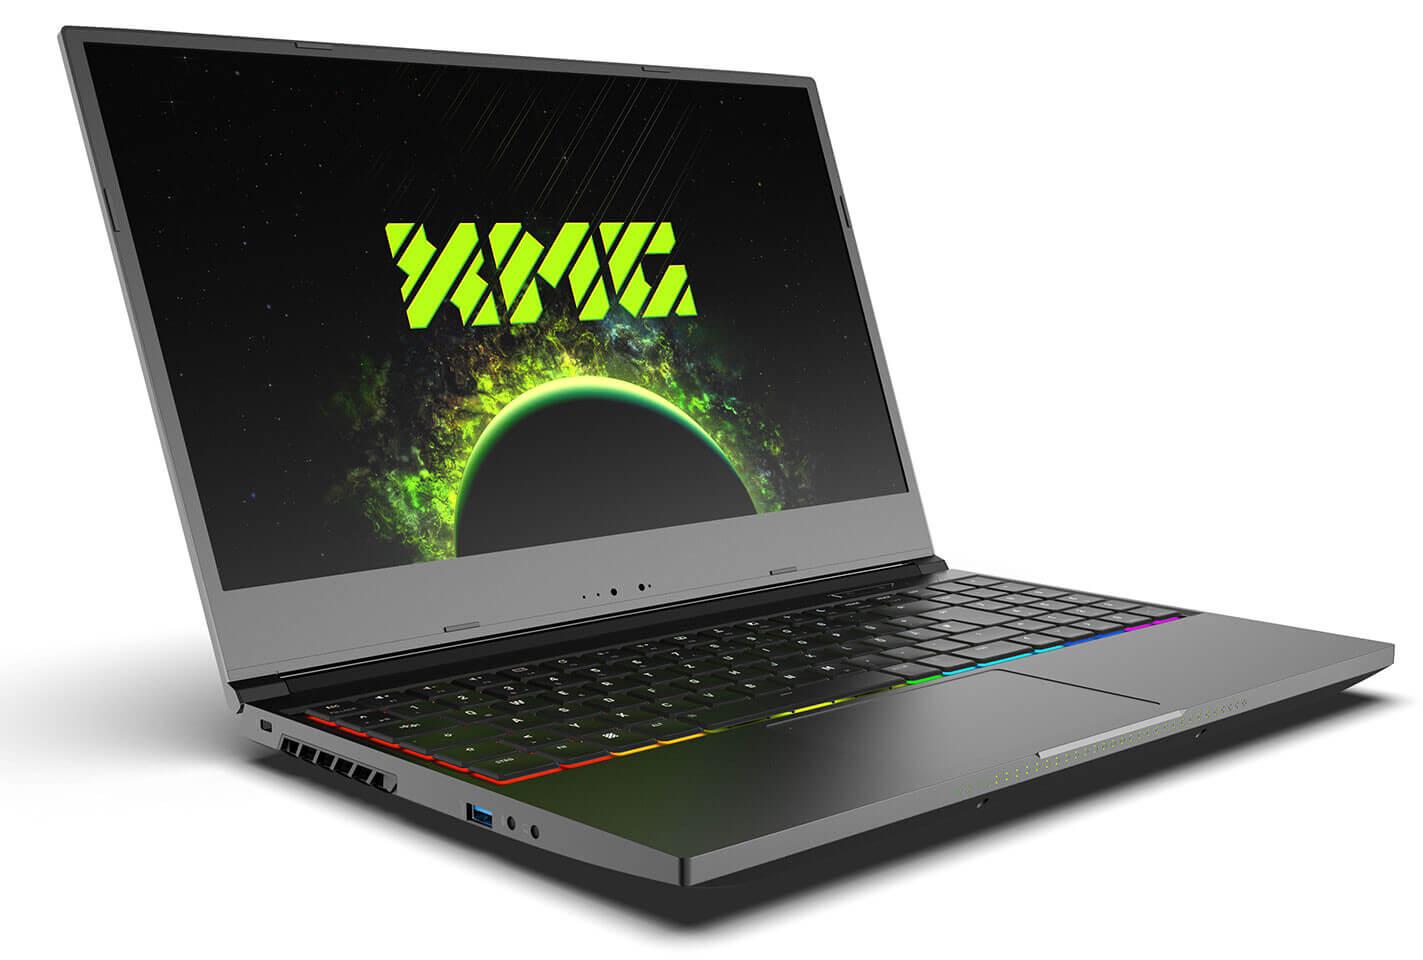 XMG NEO portátiles gaming con pantallas de 165 Hz